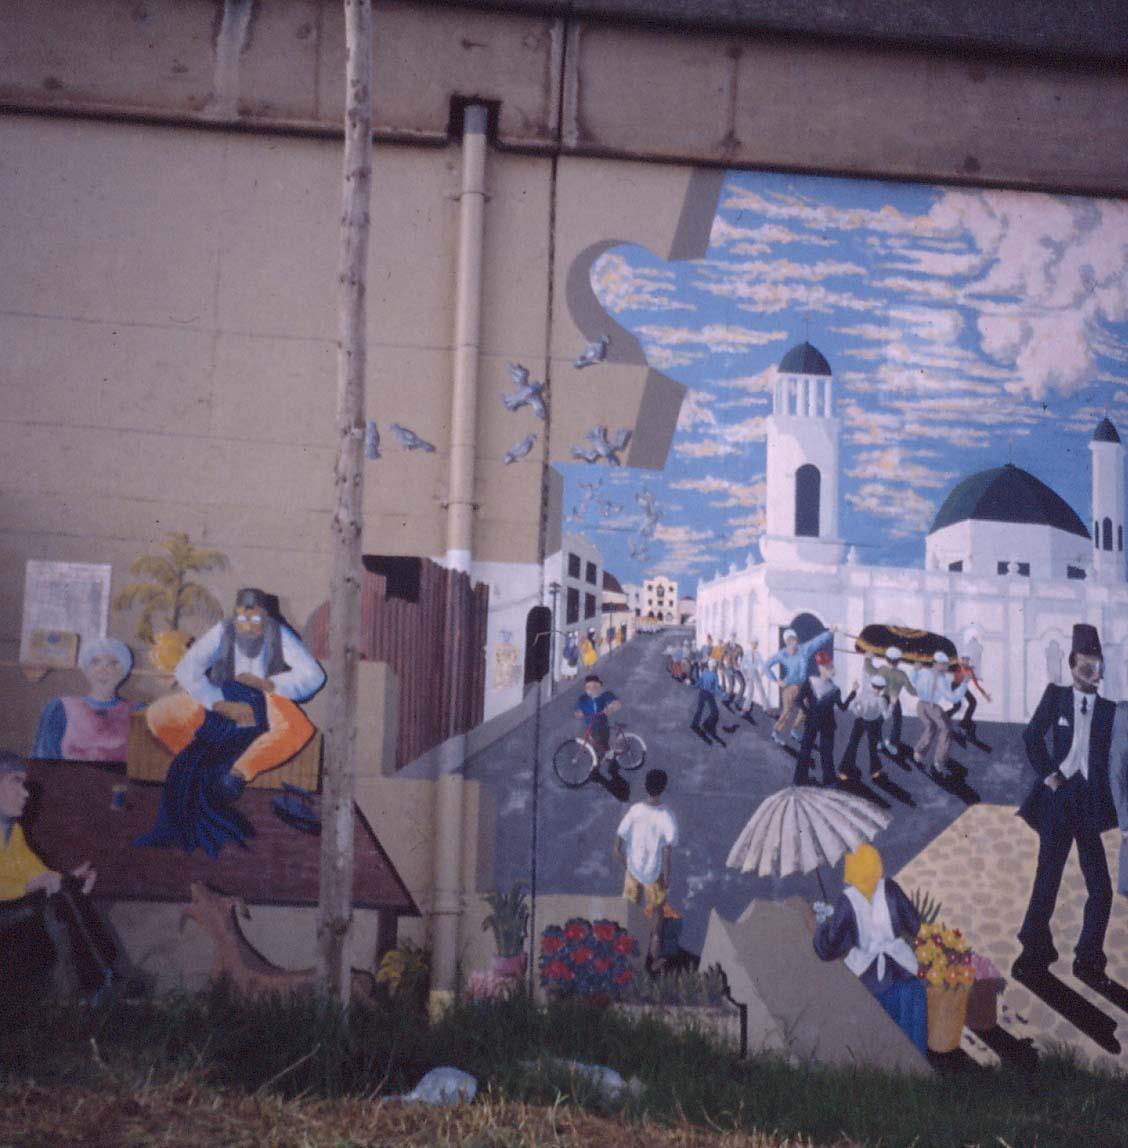 Mural, c. 1998. District Six